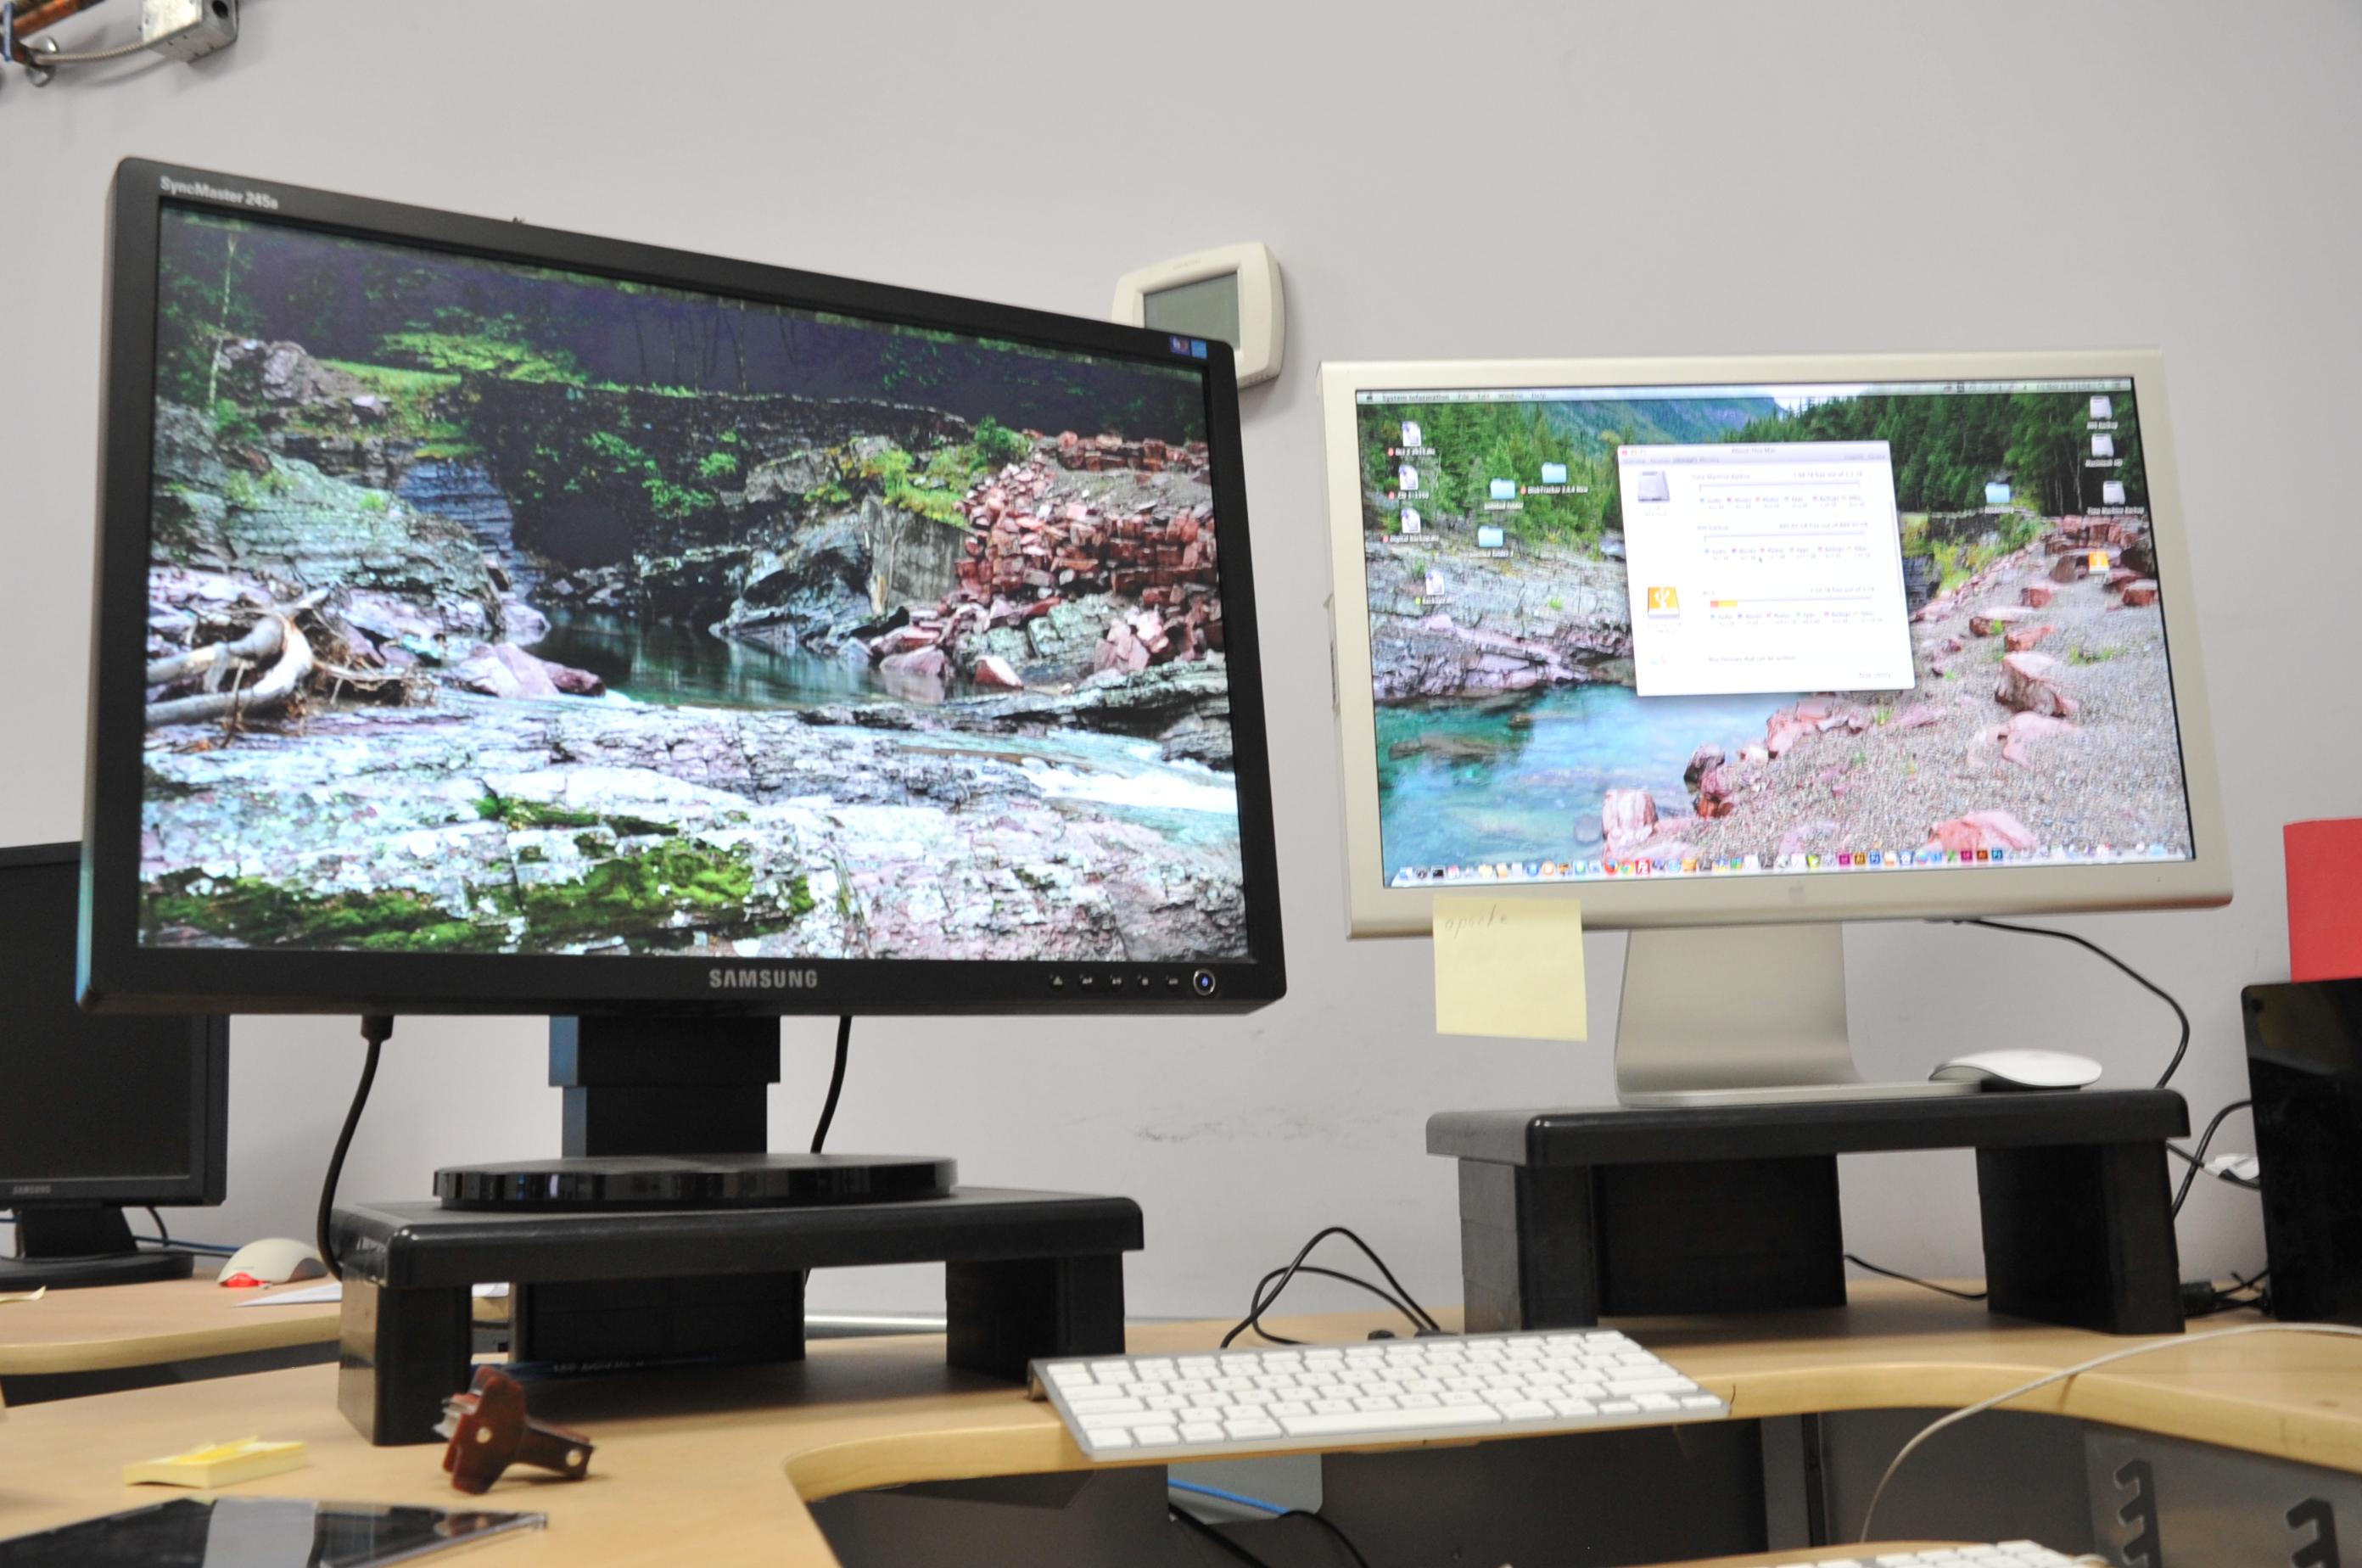 Mac Model Pro G5 Quad Core 2.8Ghz Xeon Processor; Serial Number: H00471R9EUG; 6Gb DDR3 Memory, ATI - Image 2 of 2